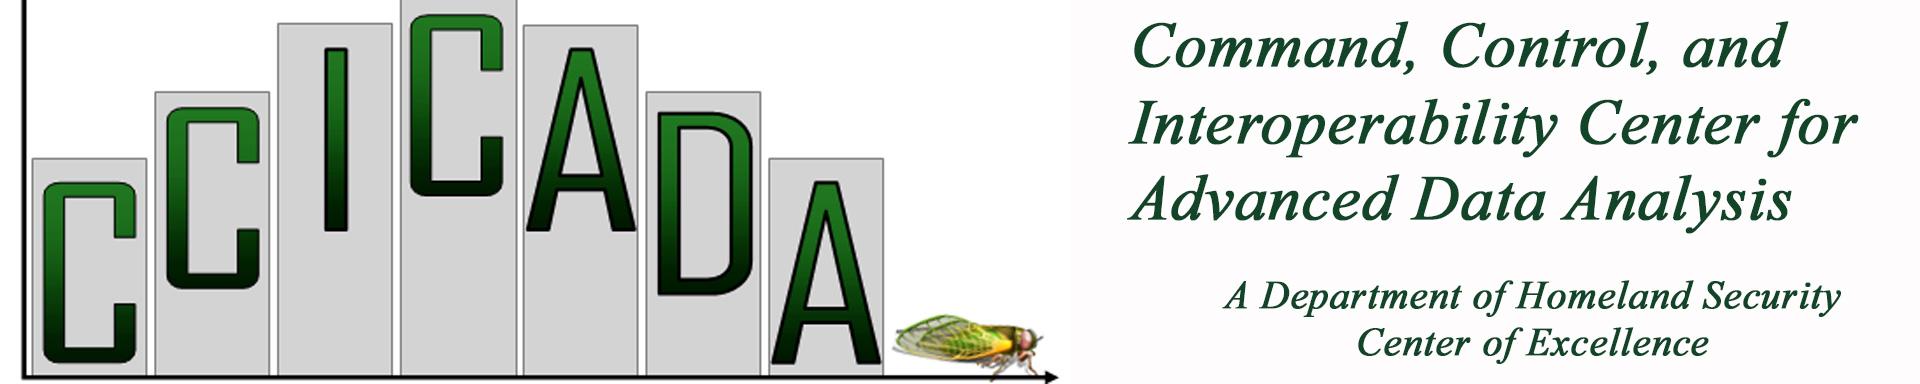 CCICADA_logo